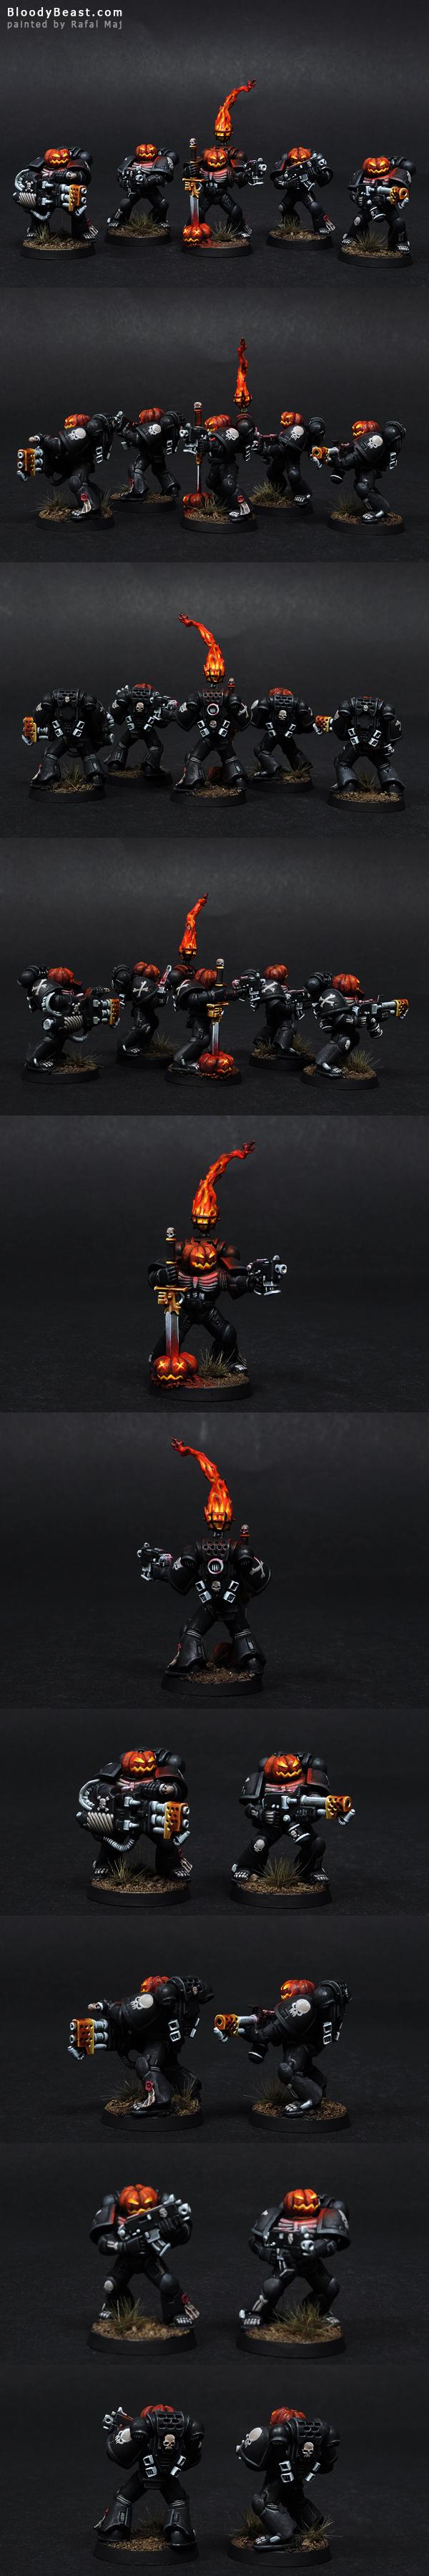 Legion Of The Damned Pumpkin painted by Rafal Maj (BloodyBeast.com)